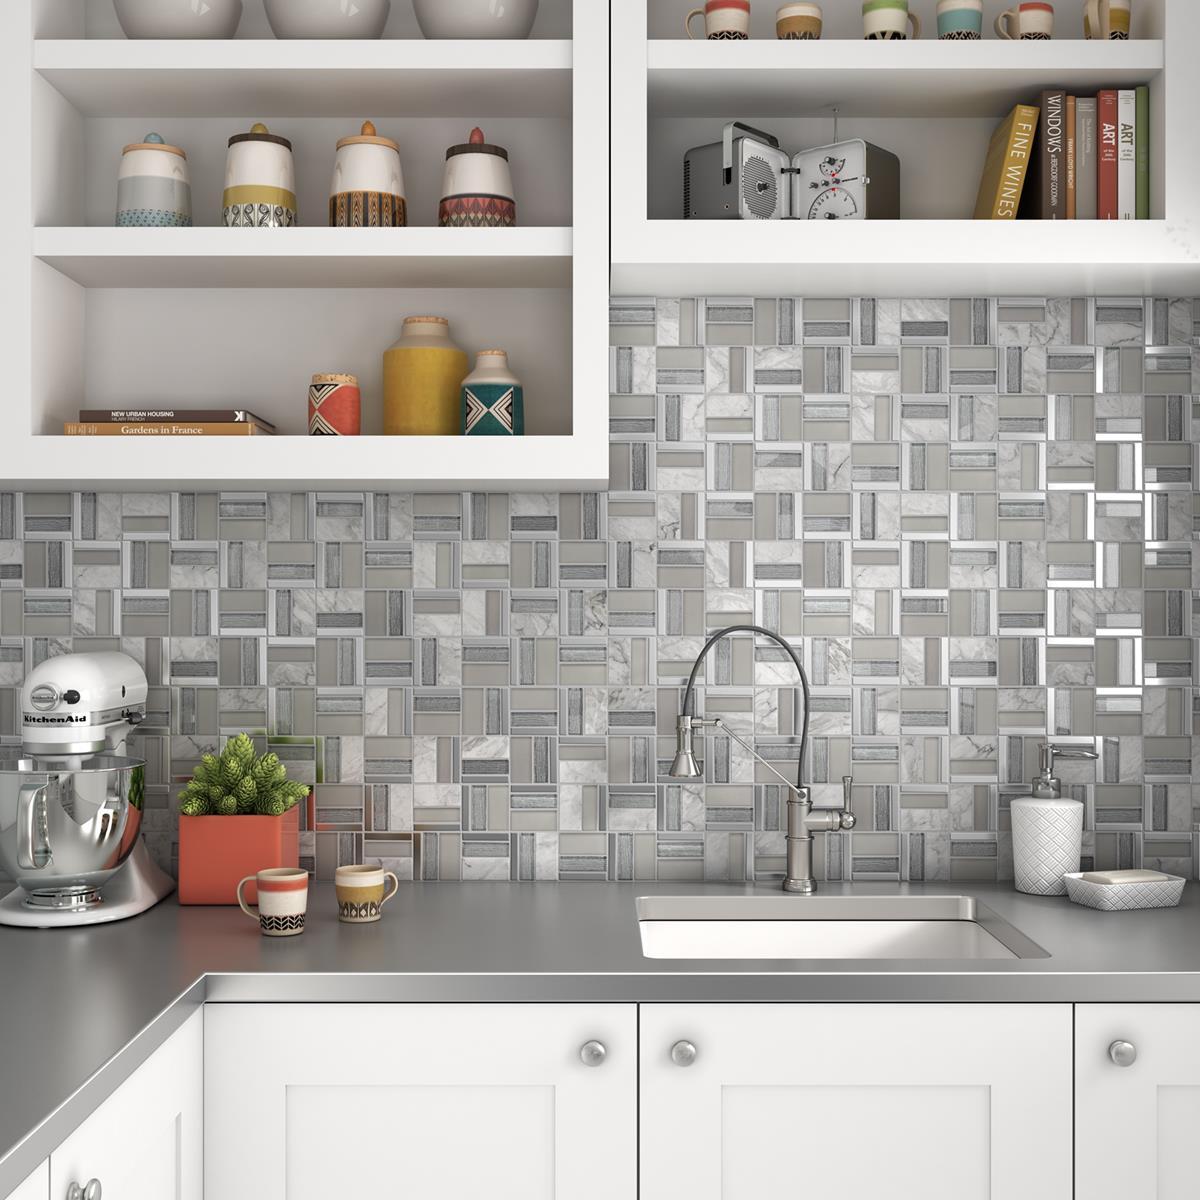 render-3d-de-mosaico-de-ceramica-plata-para-cocina